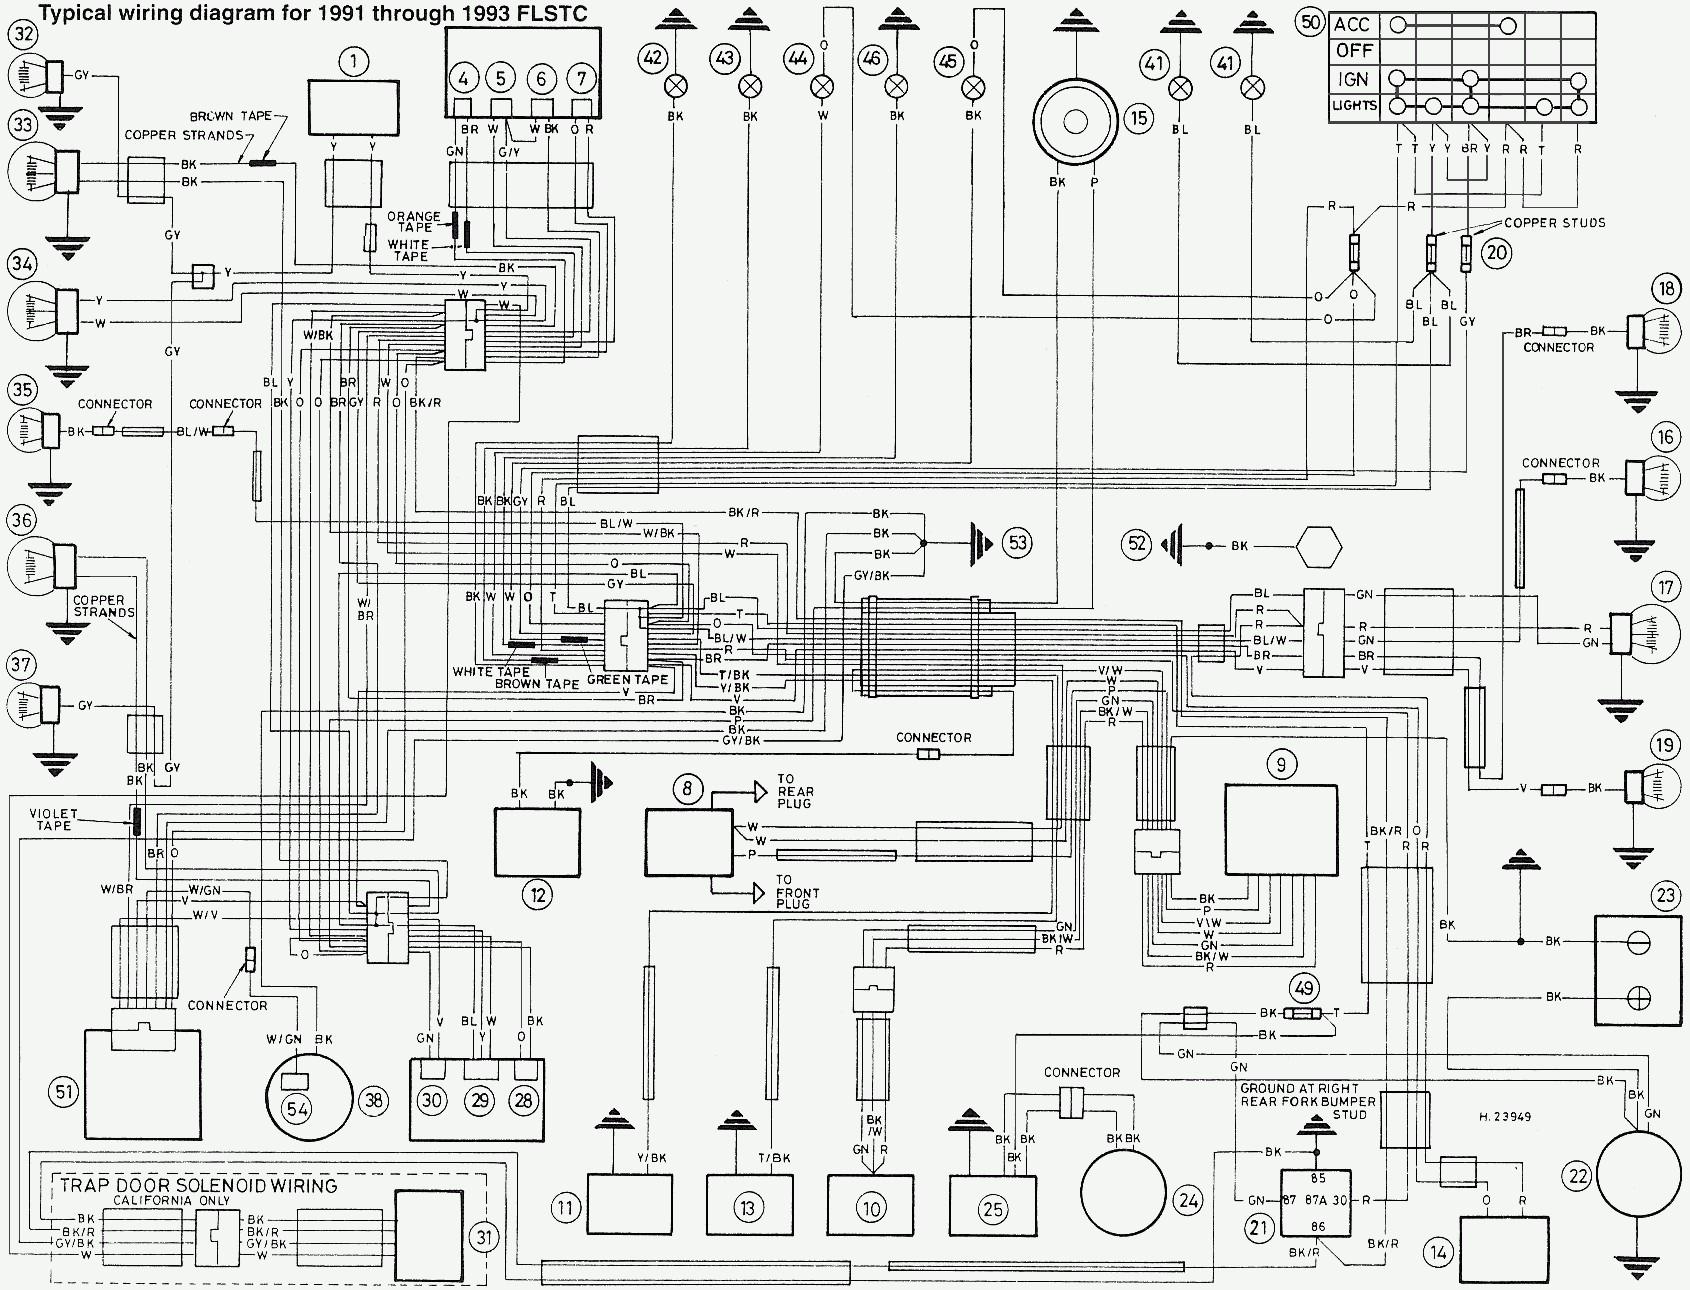 2006 Harley Wiring Diagram - Wiring Diagram Directory on